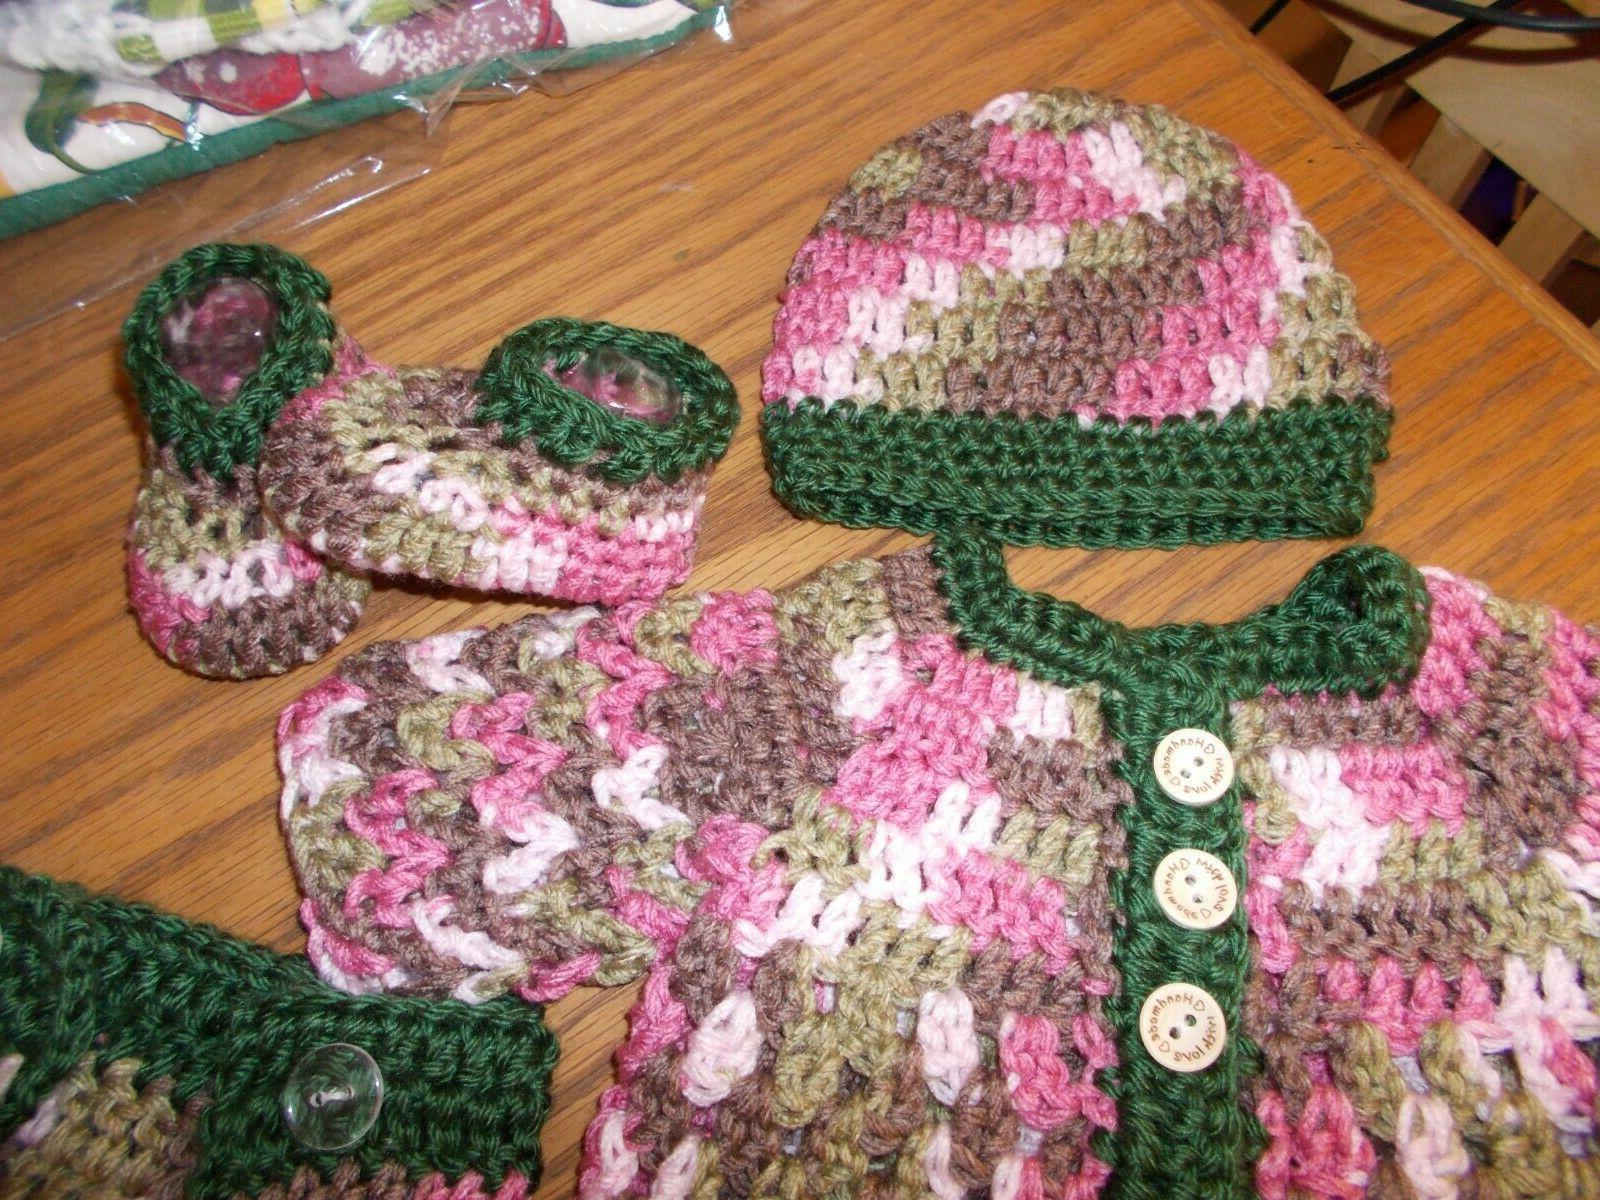 Handmade Crochet Shoes & diaper cover-Rocky Mountain